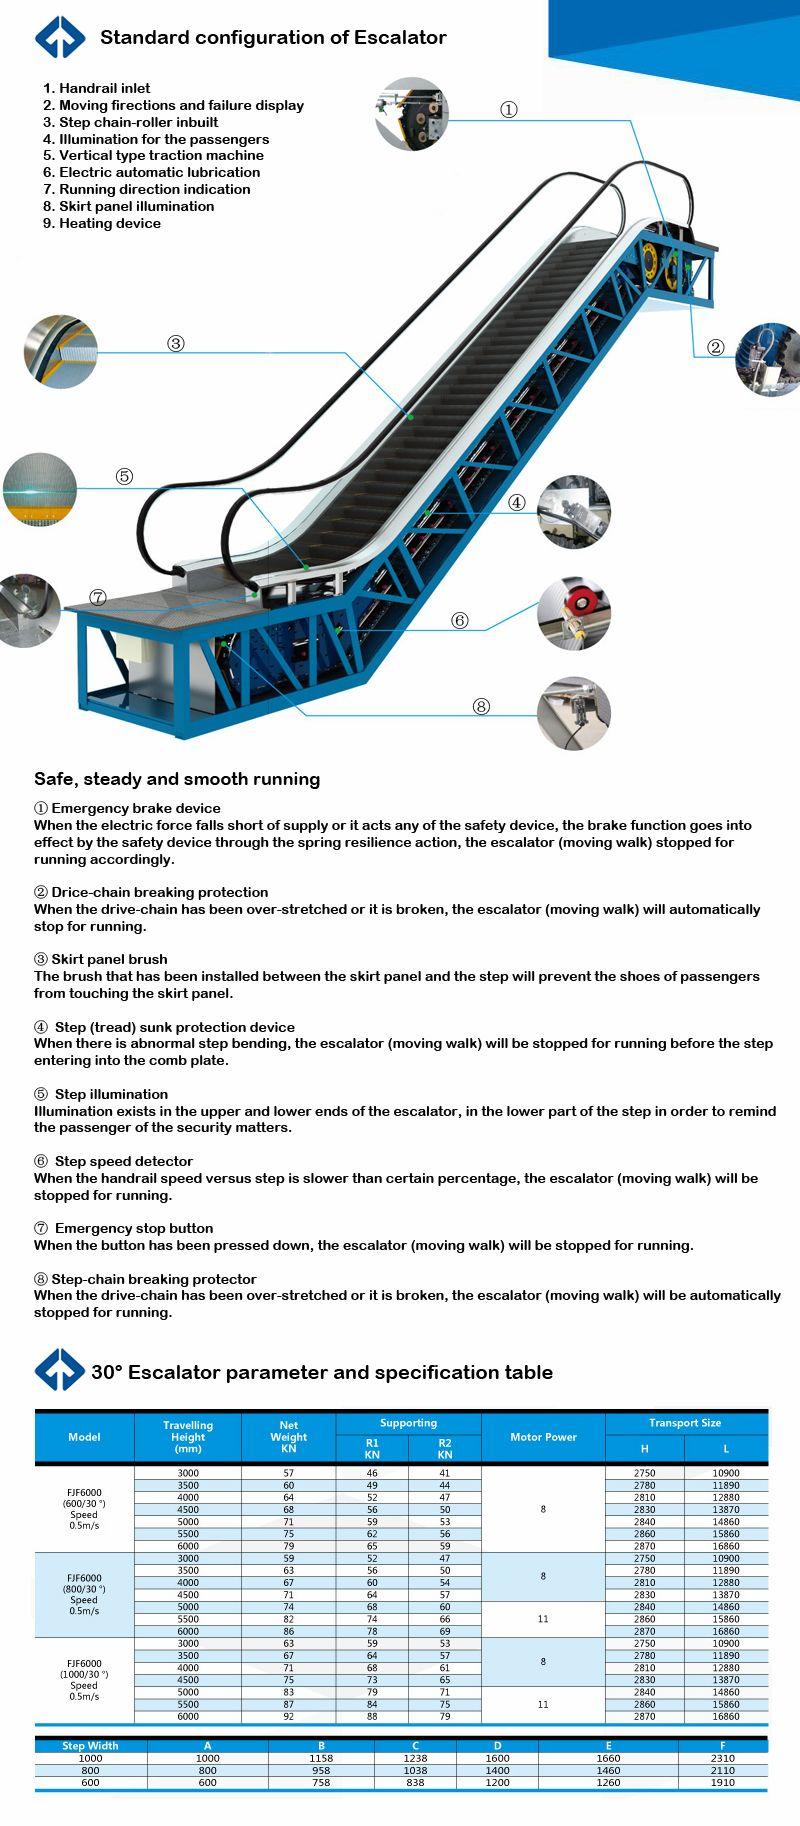 Fjzy Indoor Escalator with 30 Degree 1000mm Step Width